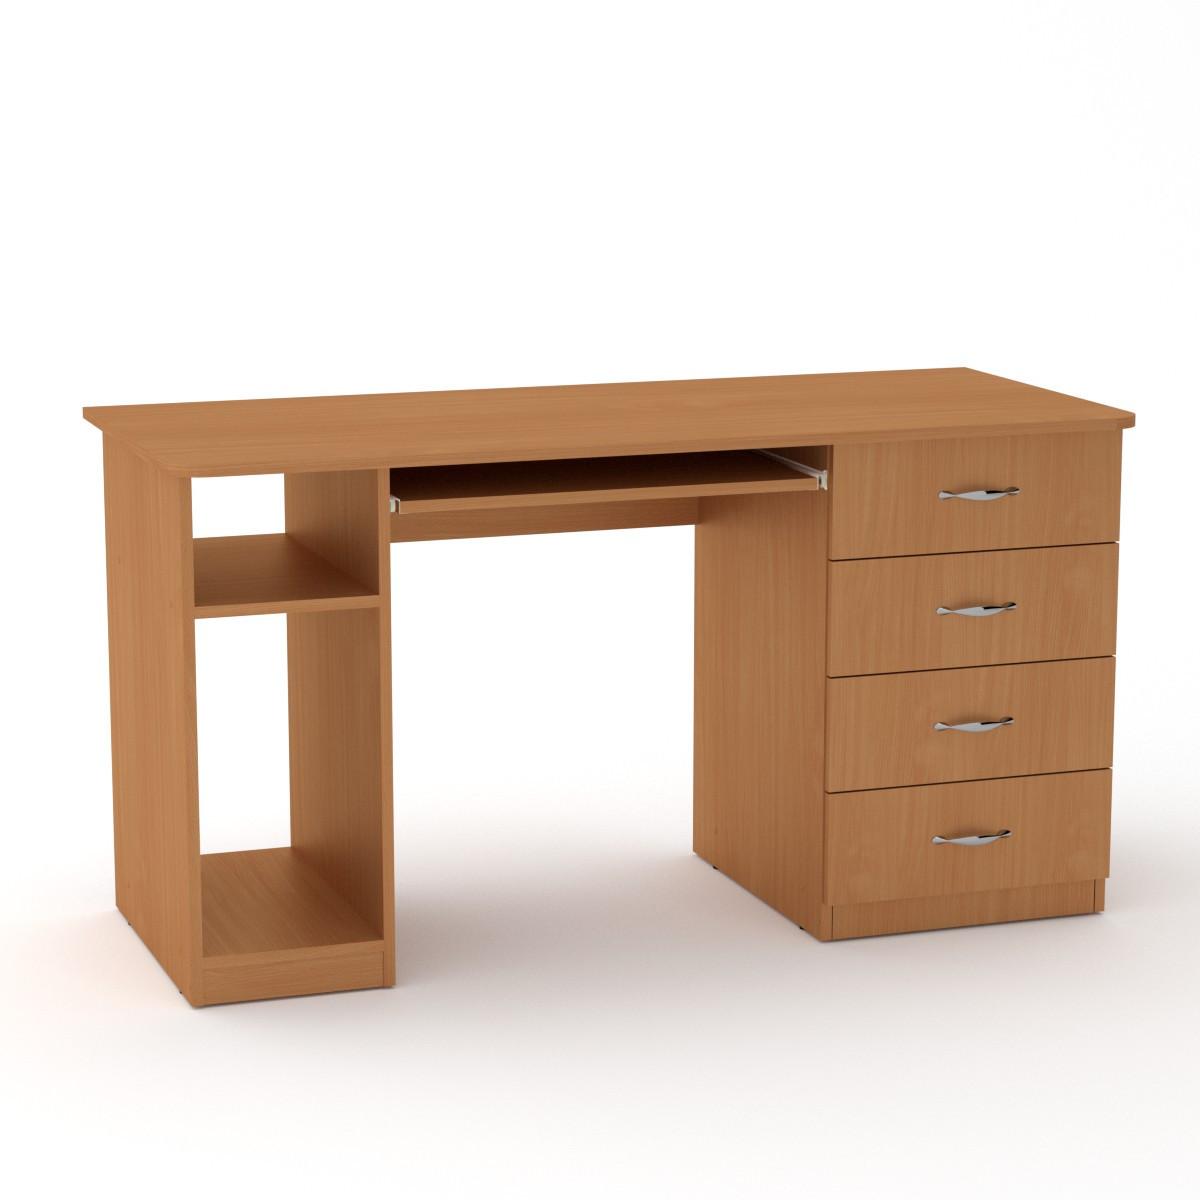 Стол компьютерный СКМ-11 бук Компанит (140х60х74 см)